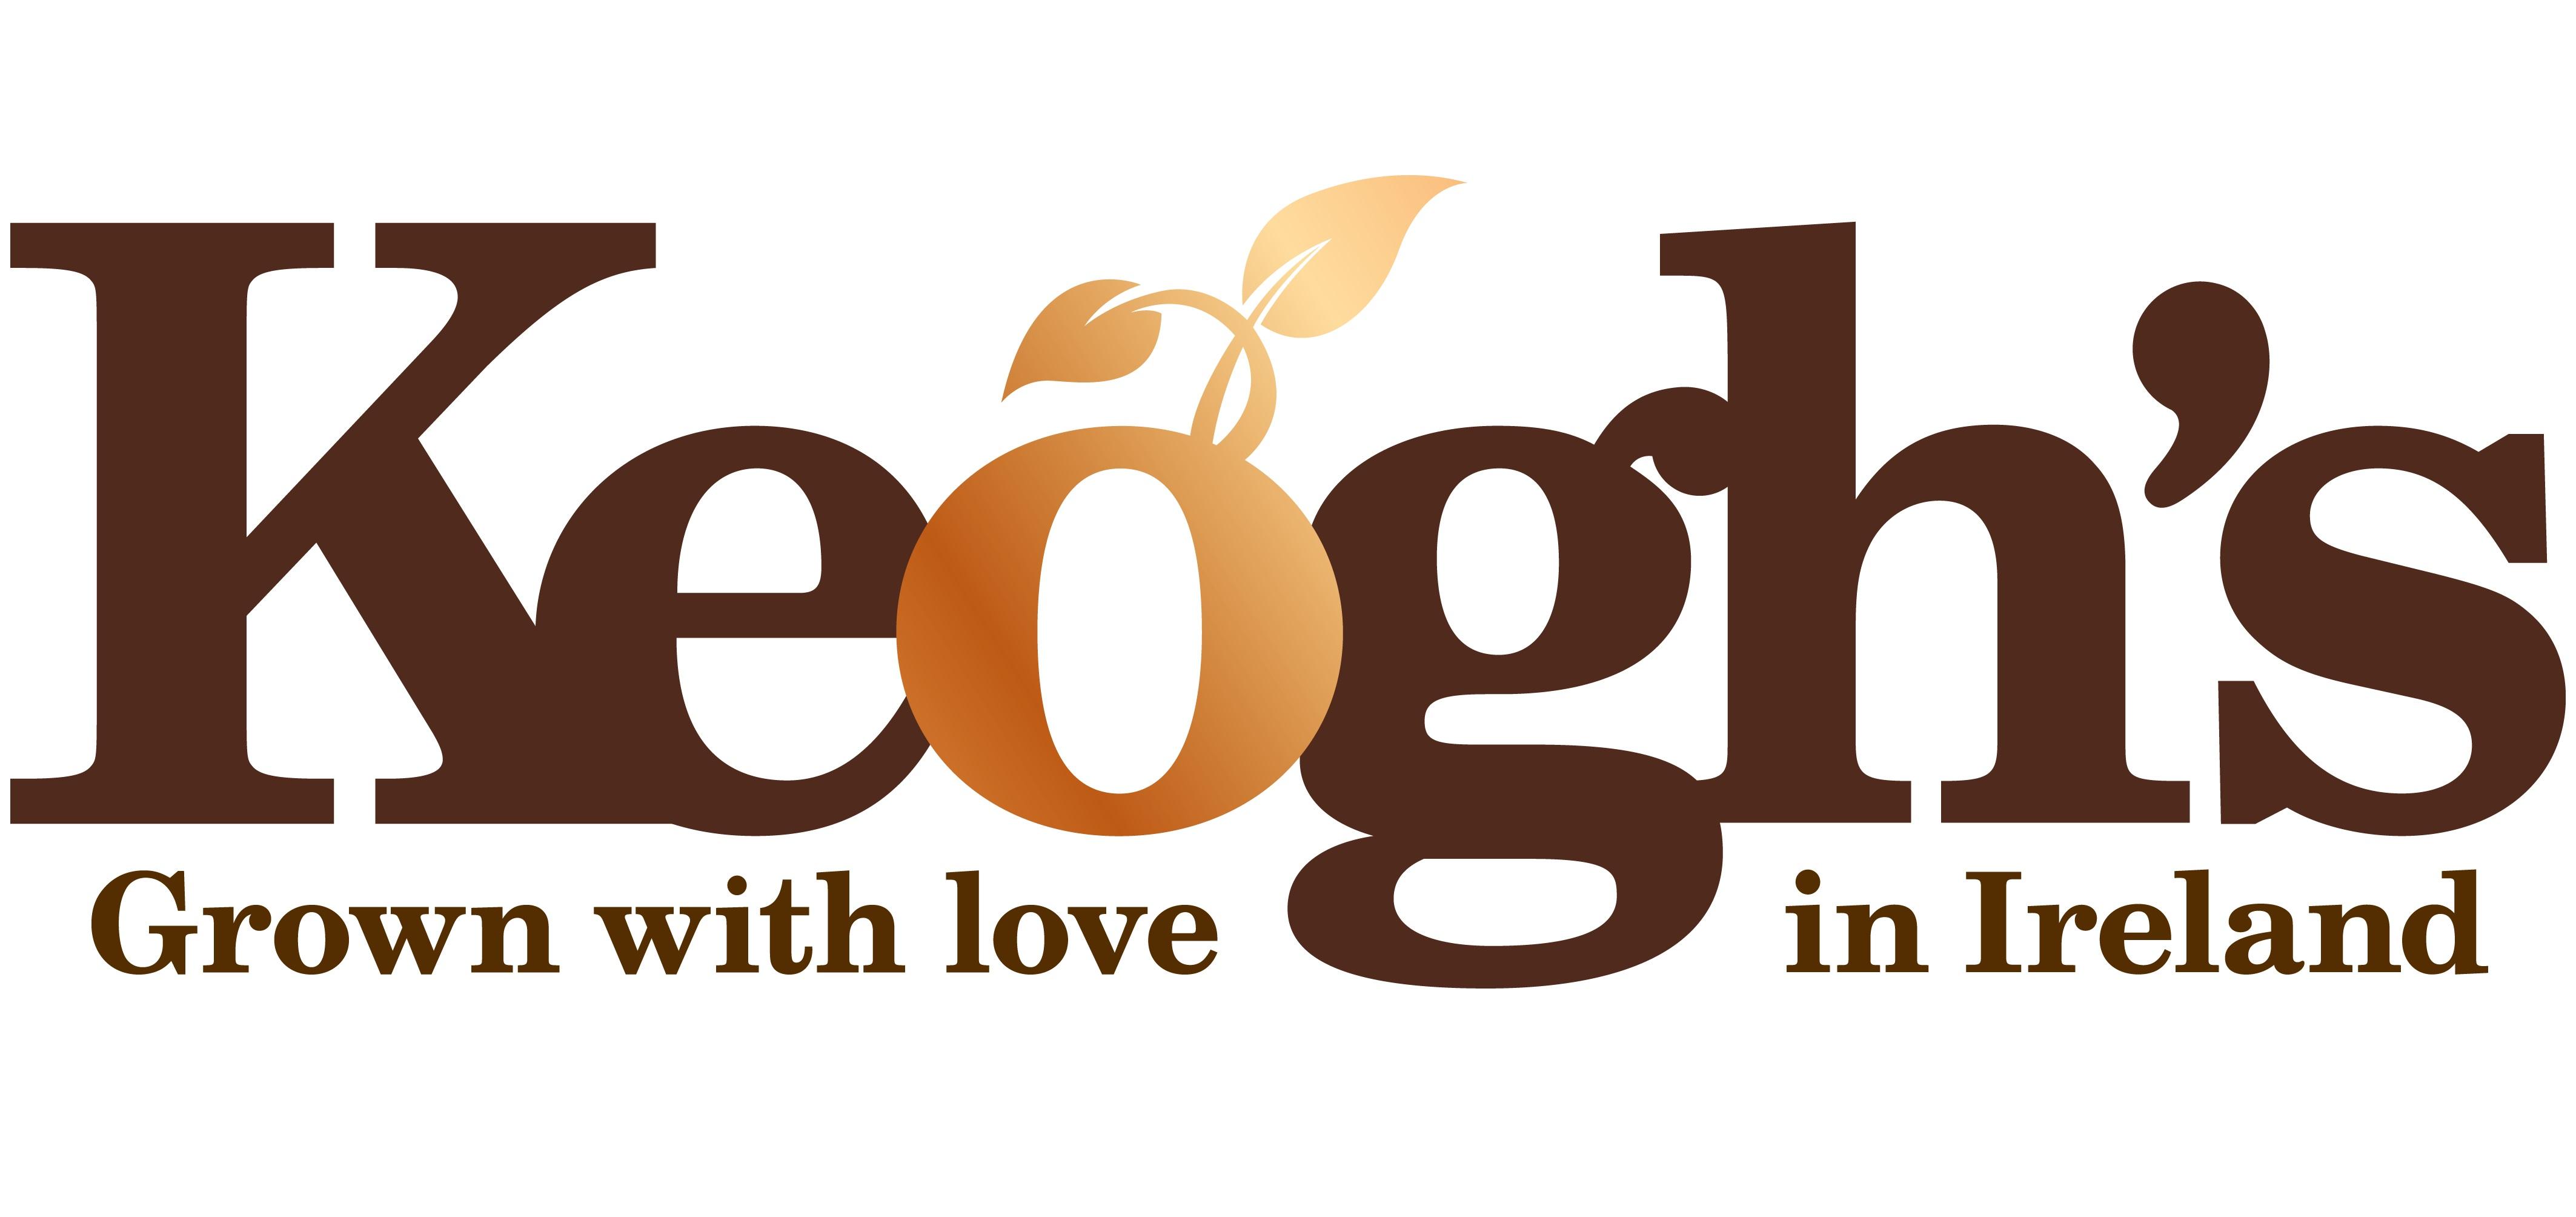 Keogh's logotype